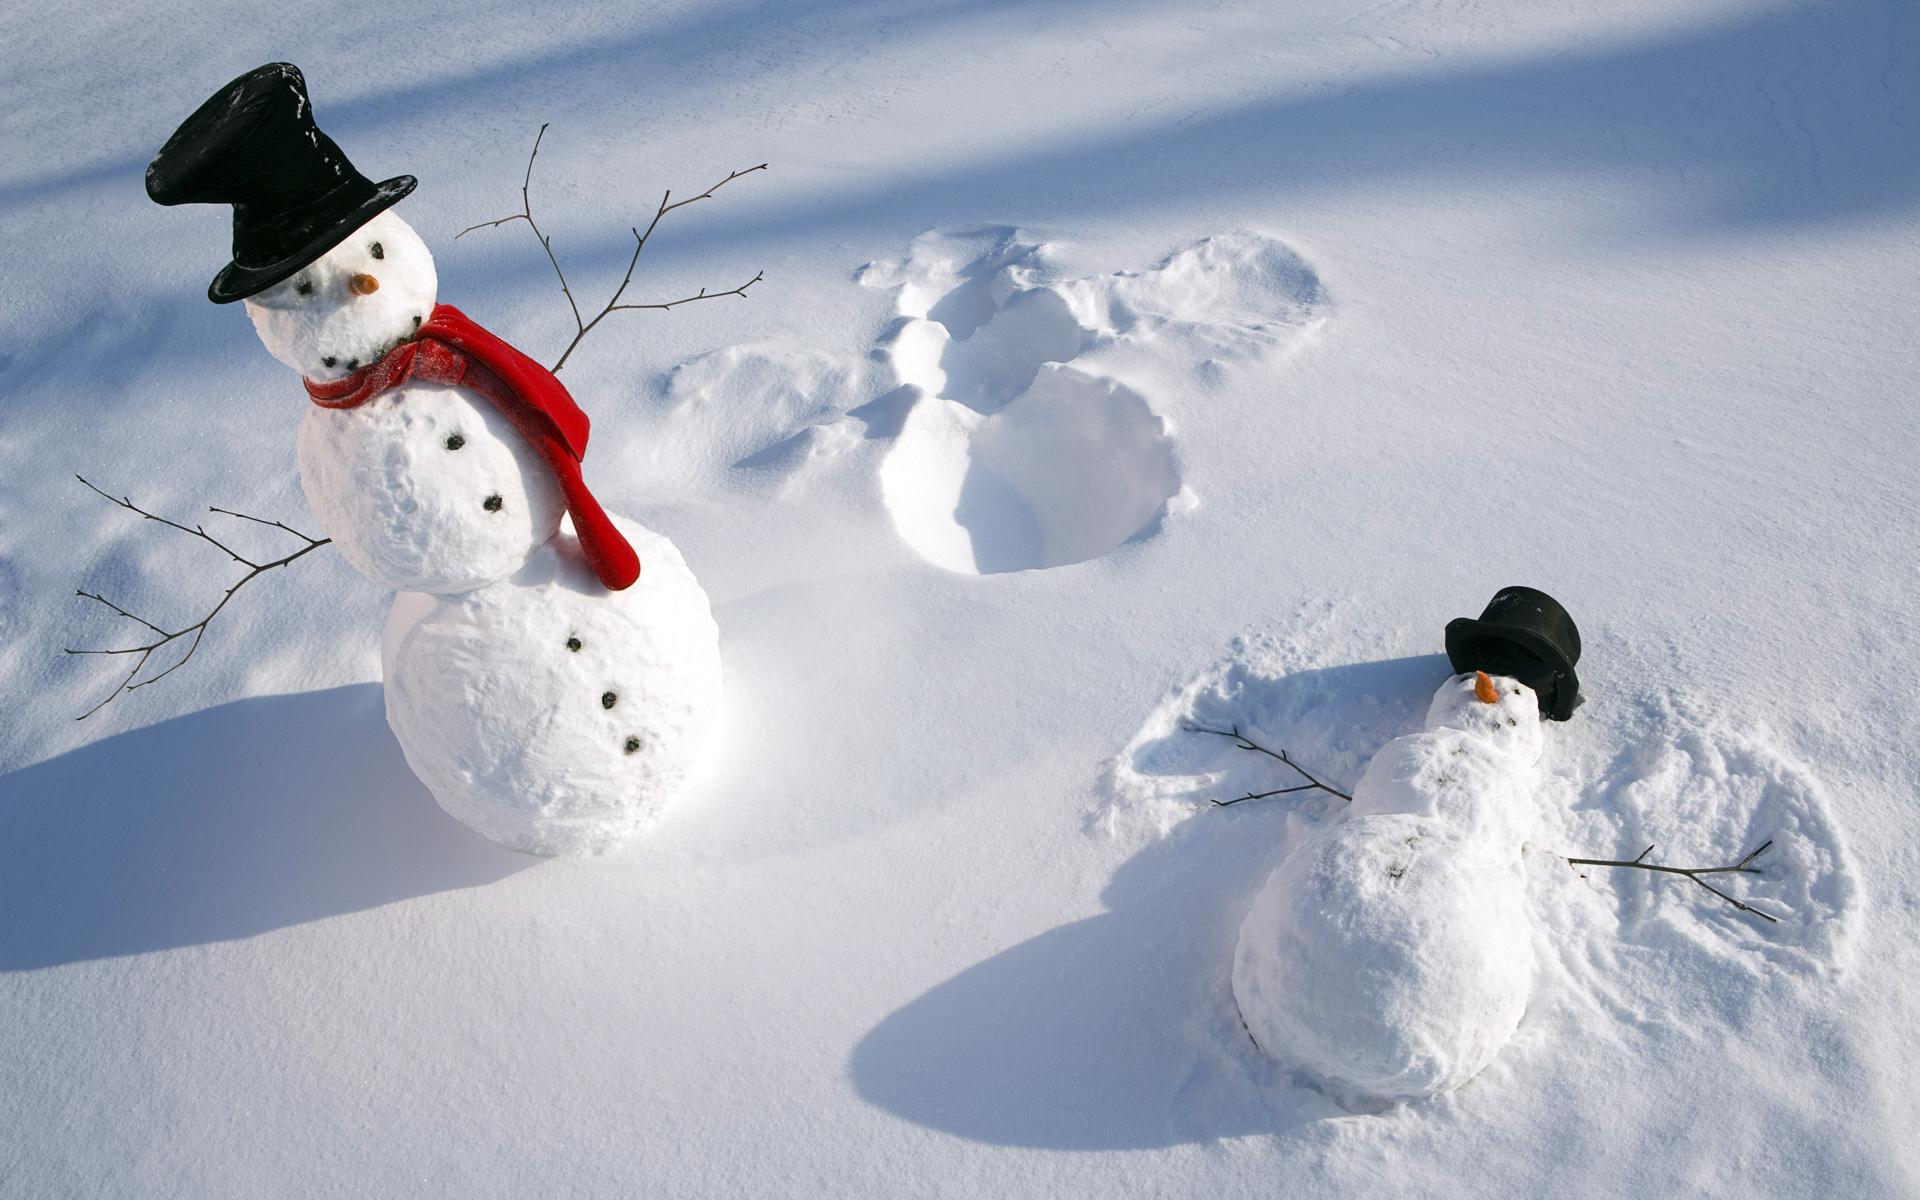 cute_snowmen_snowman_snowy_winter_nature_hd-wallpaper-1277696